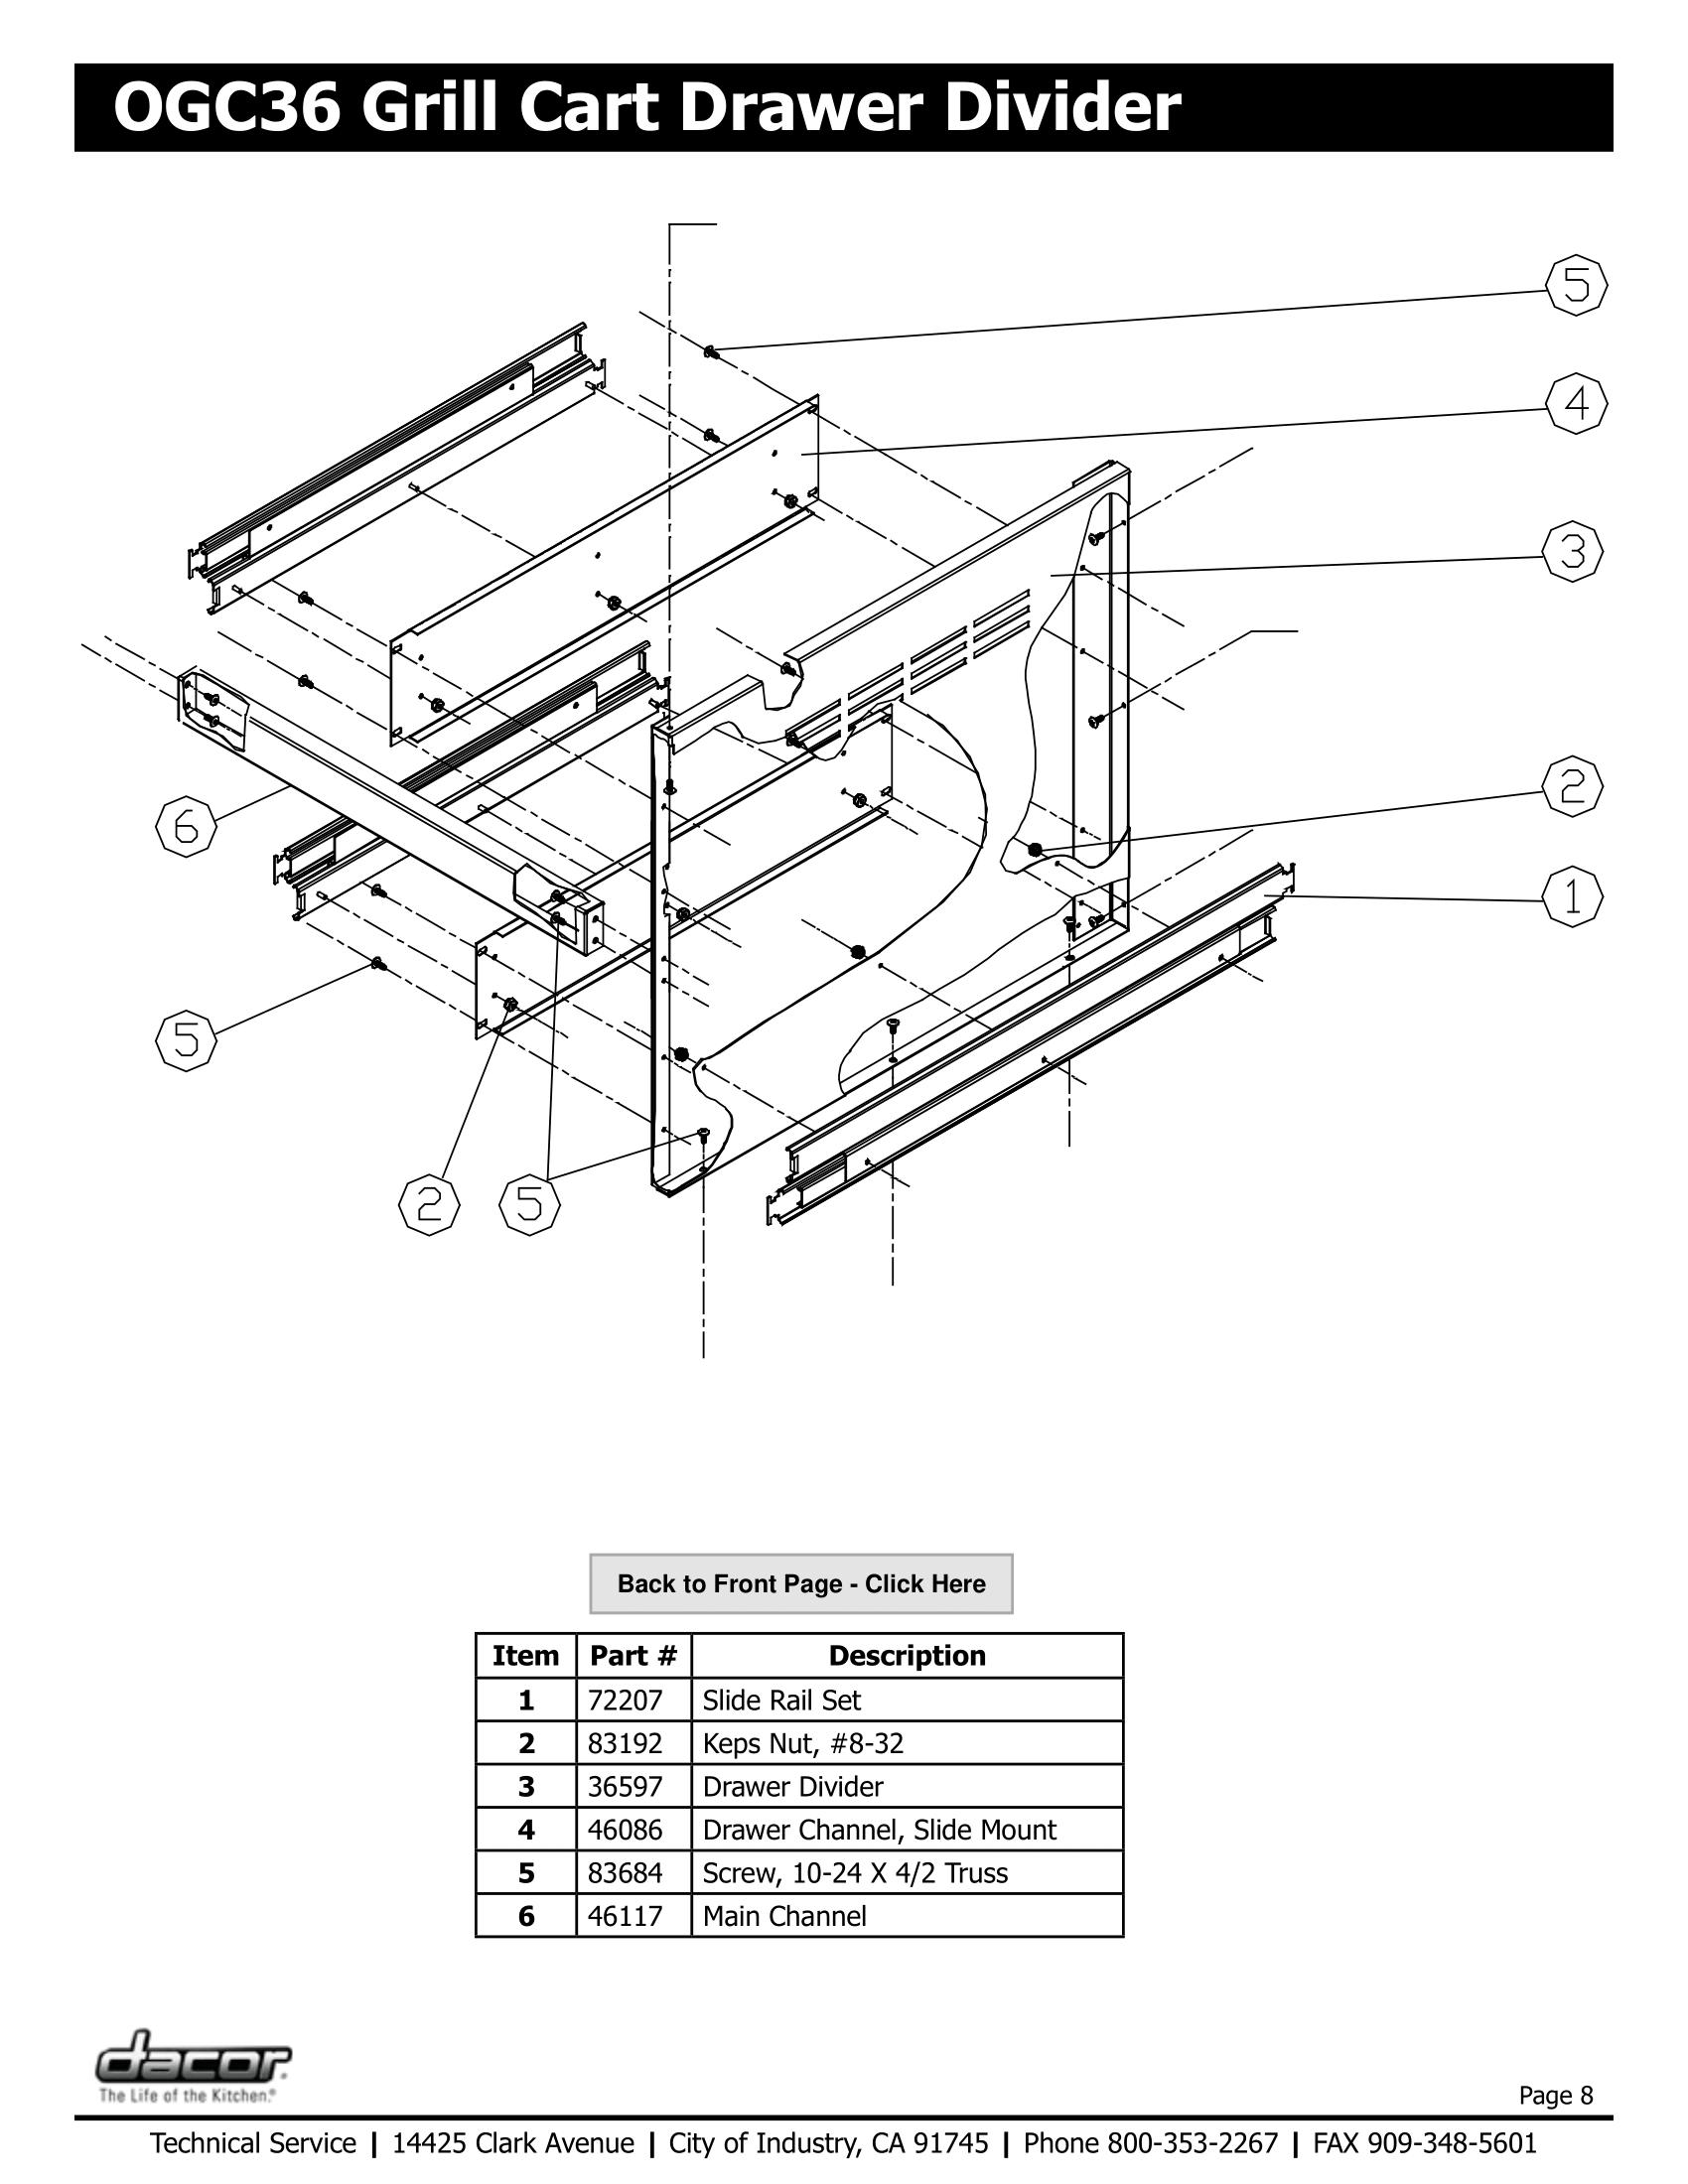 Dacor OGC36 Drawer Divider Schematic